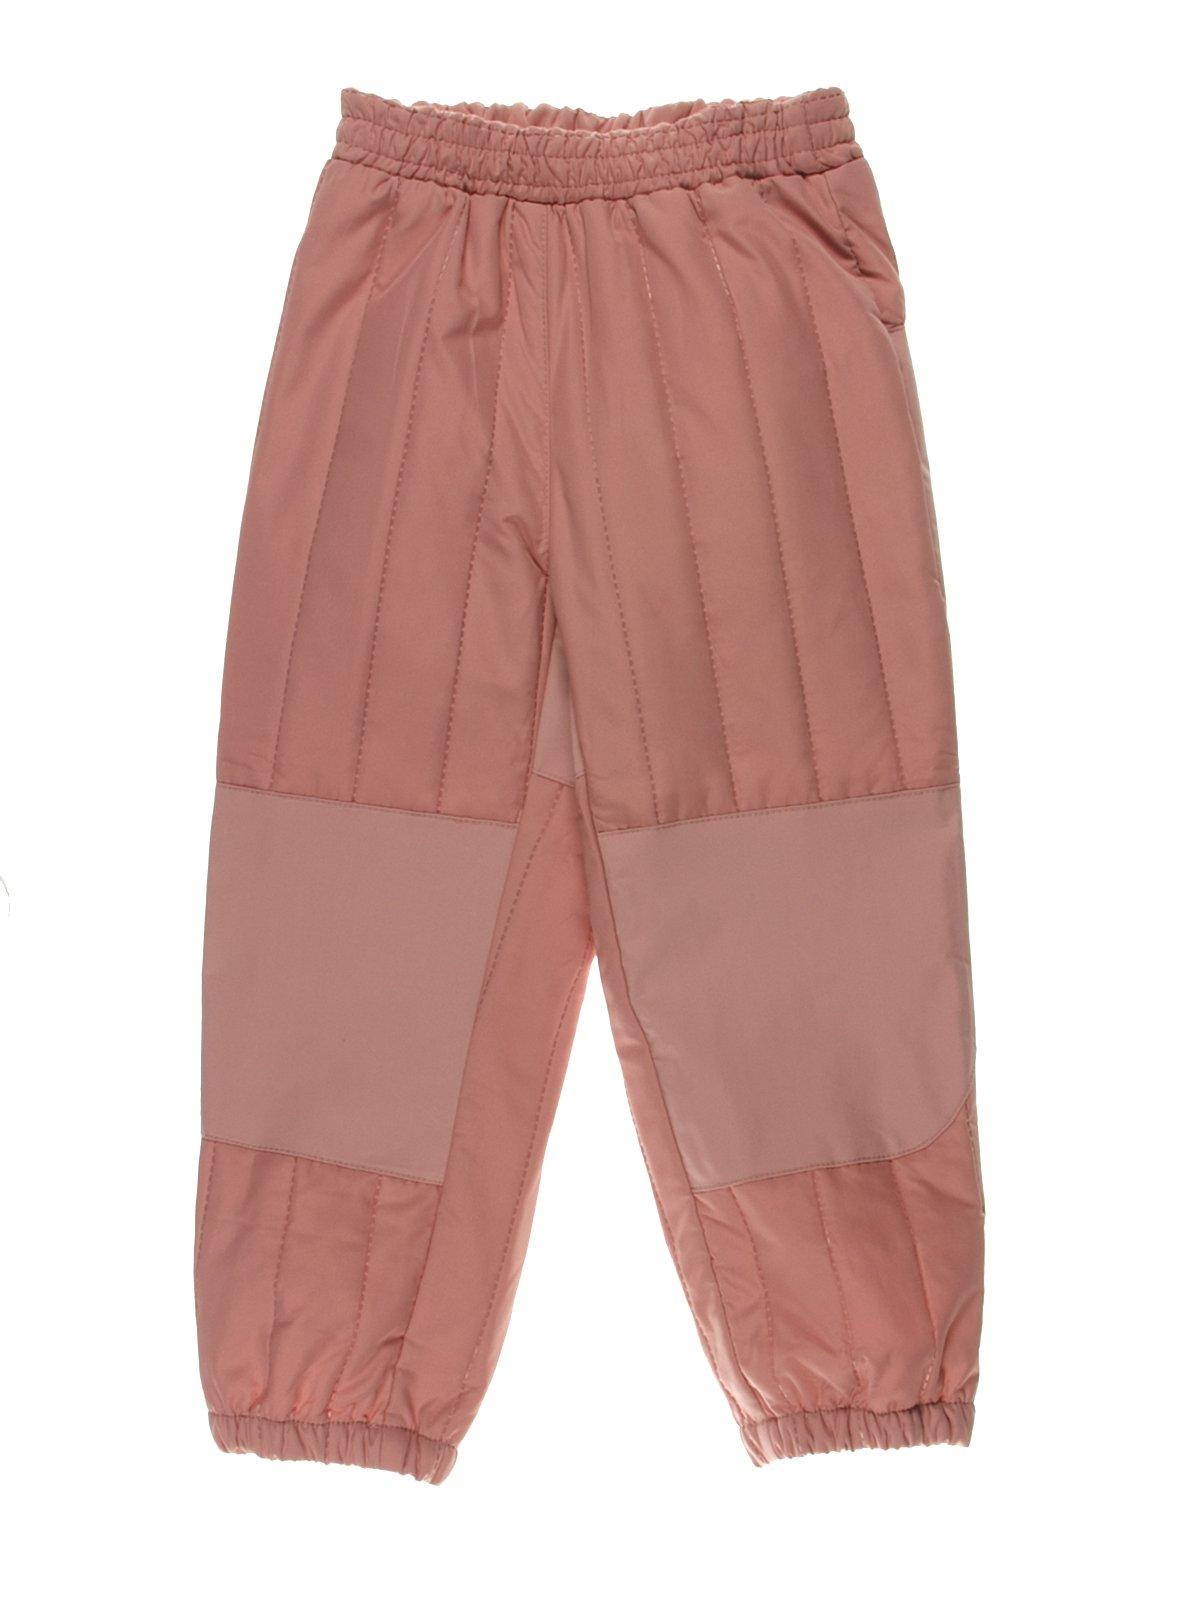 Термоштани рожеві | 3879674